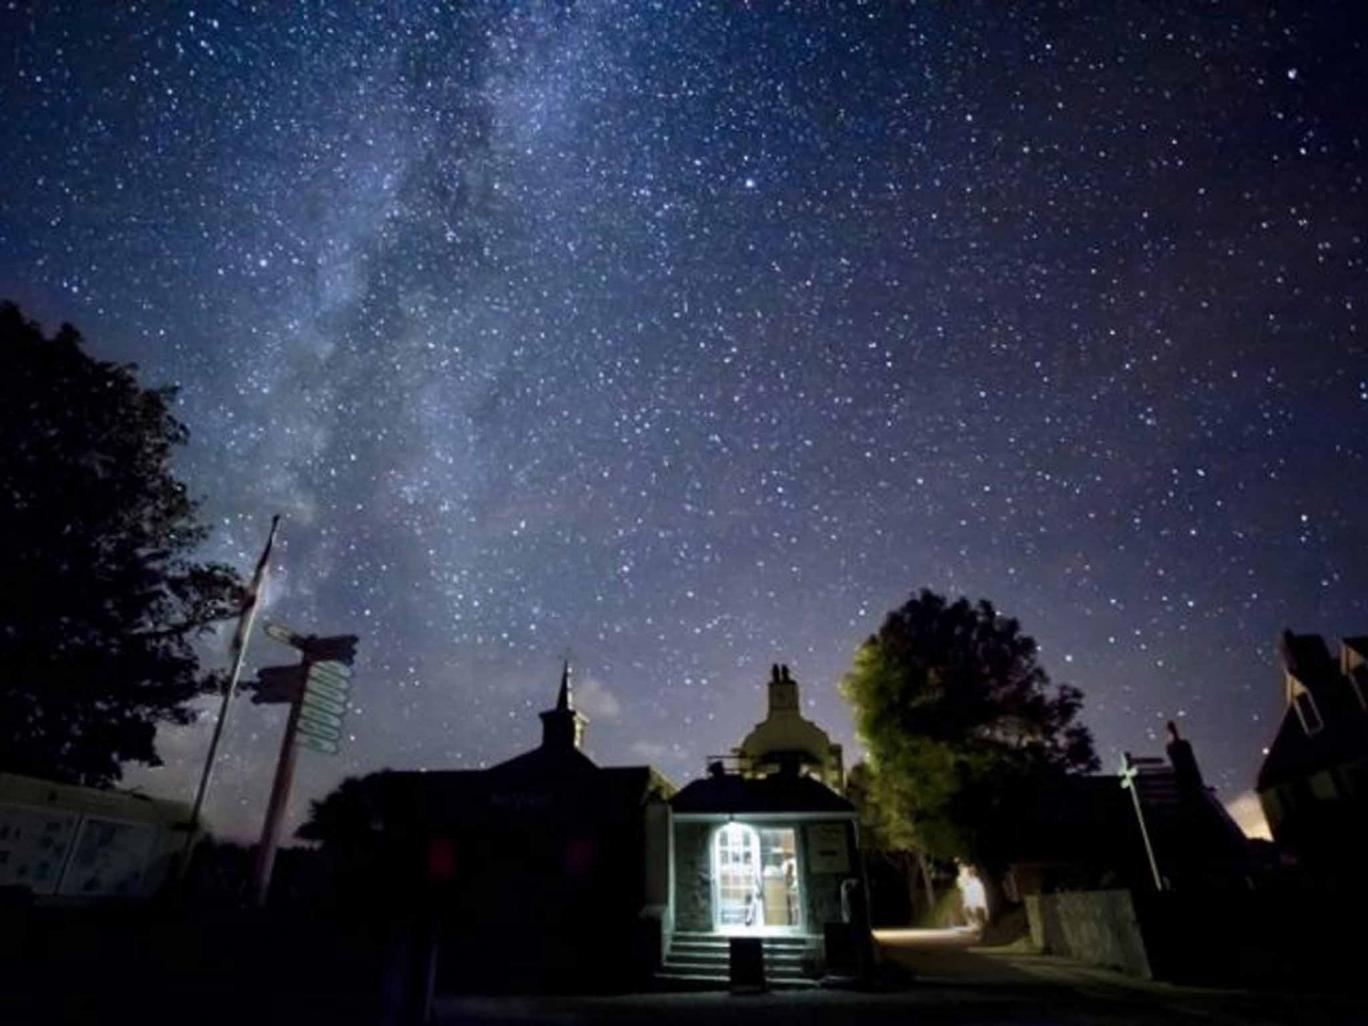 Looking Up In Sark The World S First Dark Sky Island Dark Skies Stargazing Sark